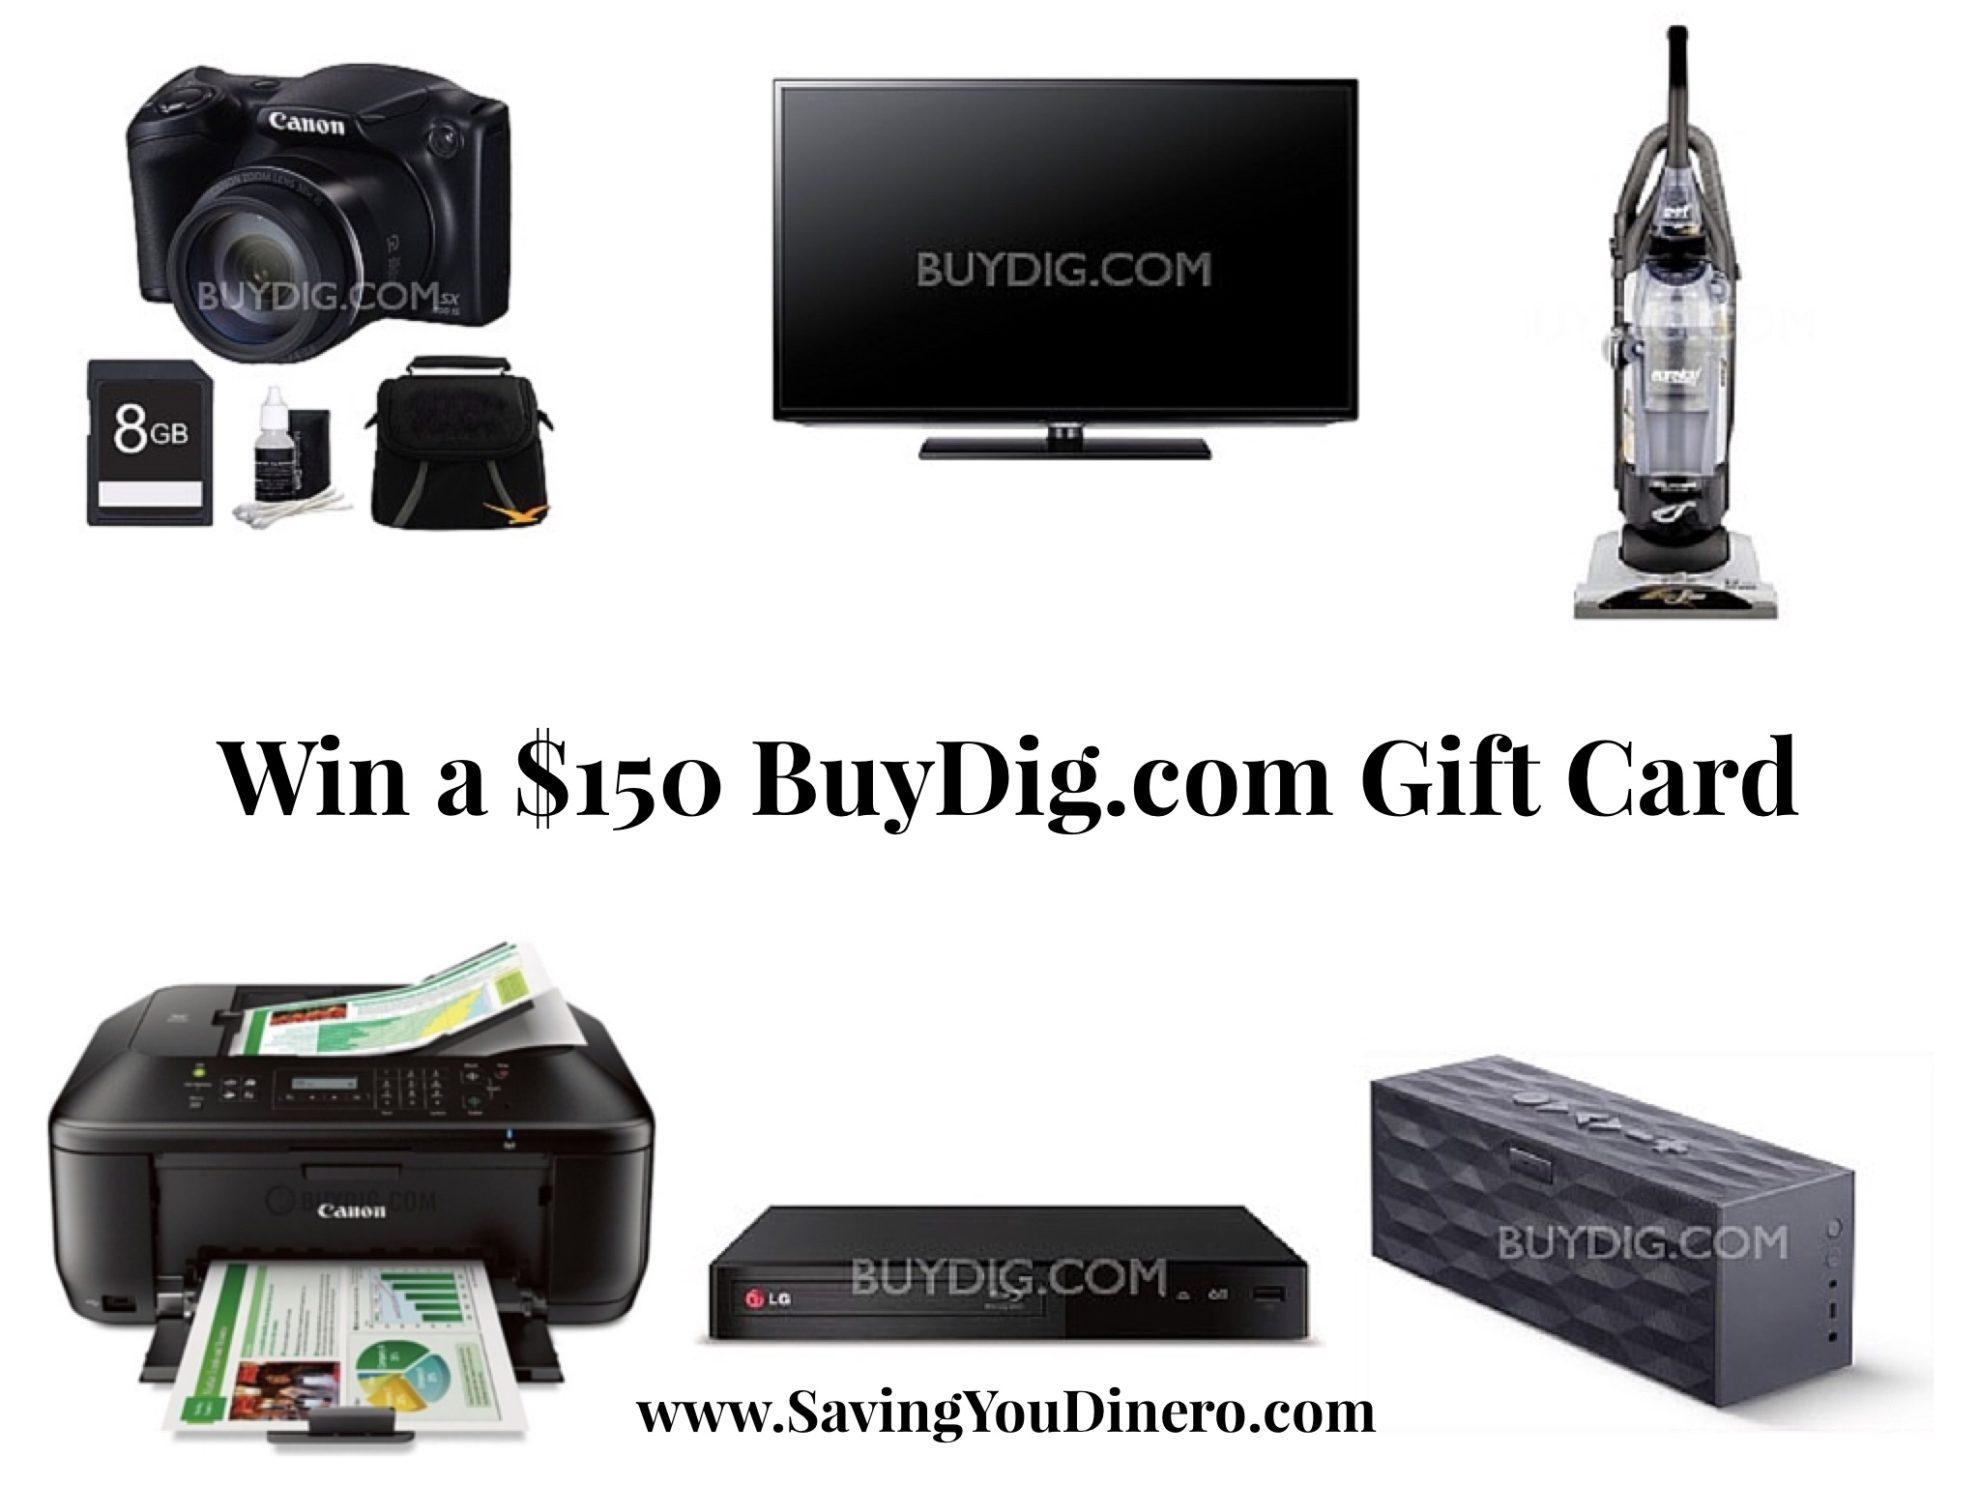 $150 BuyDig.com Gift Card Giveaway